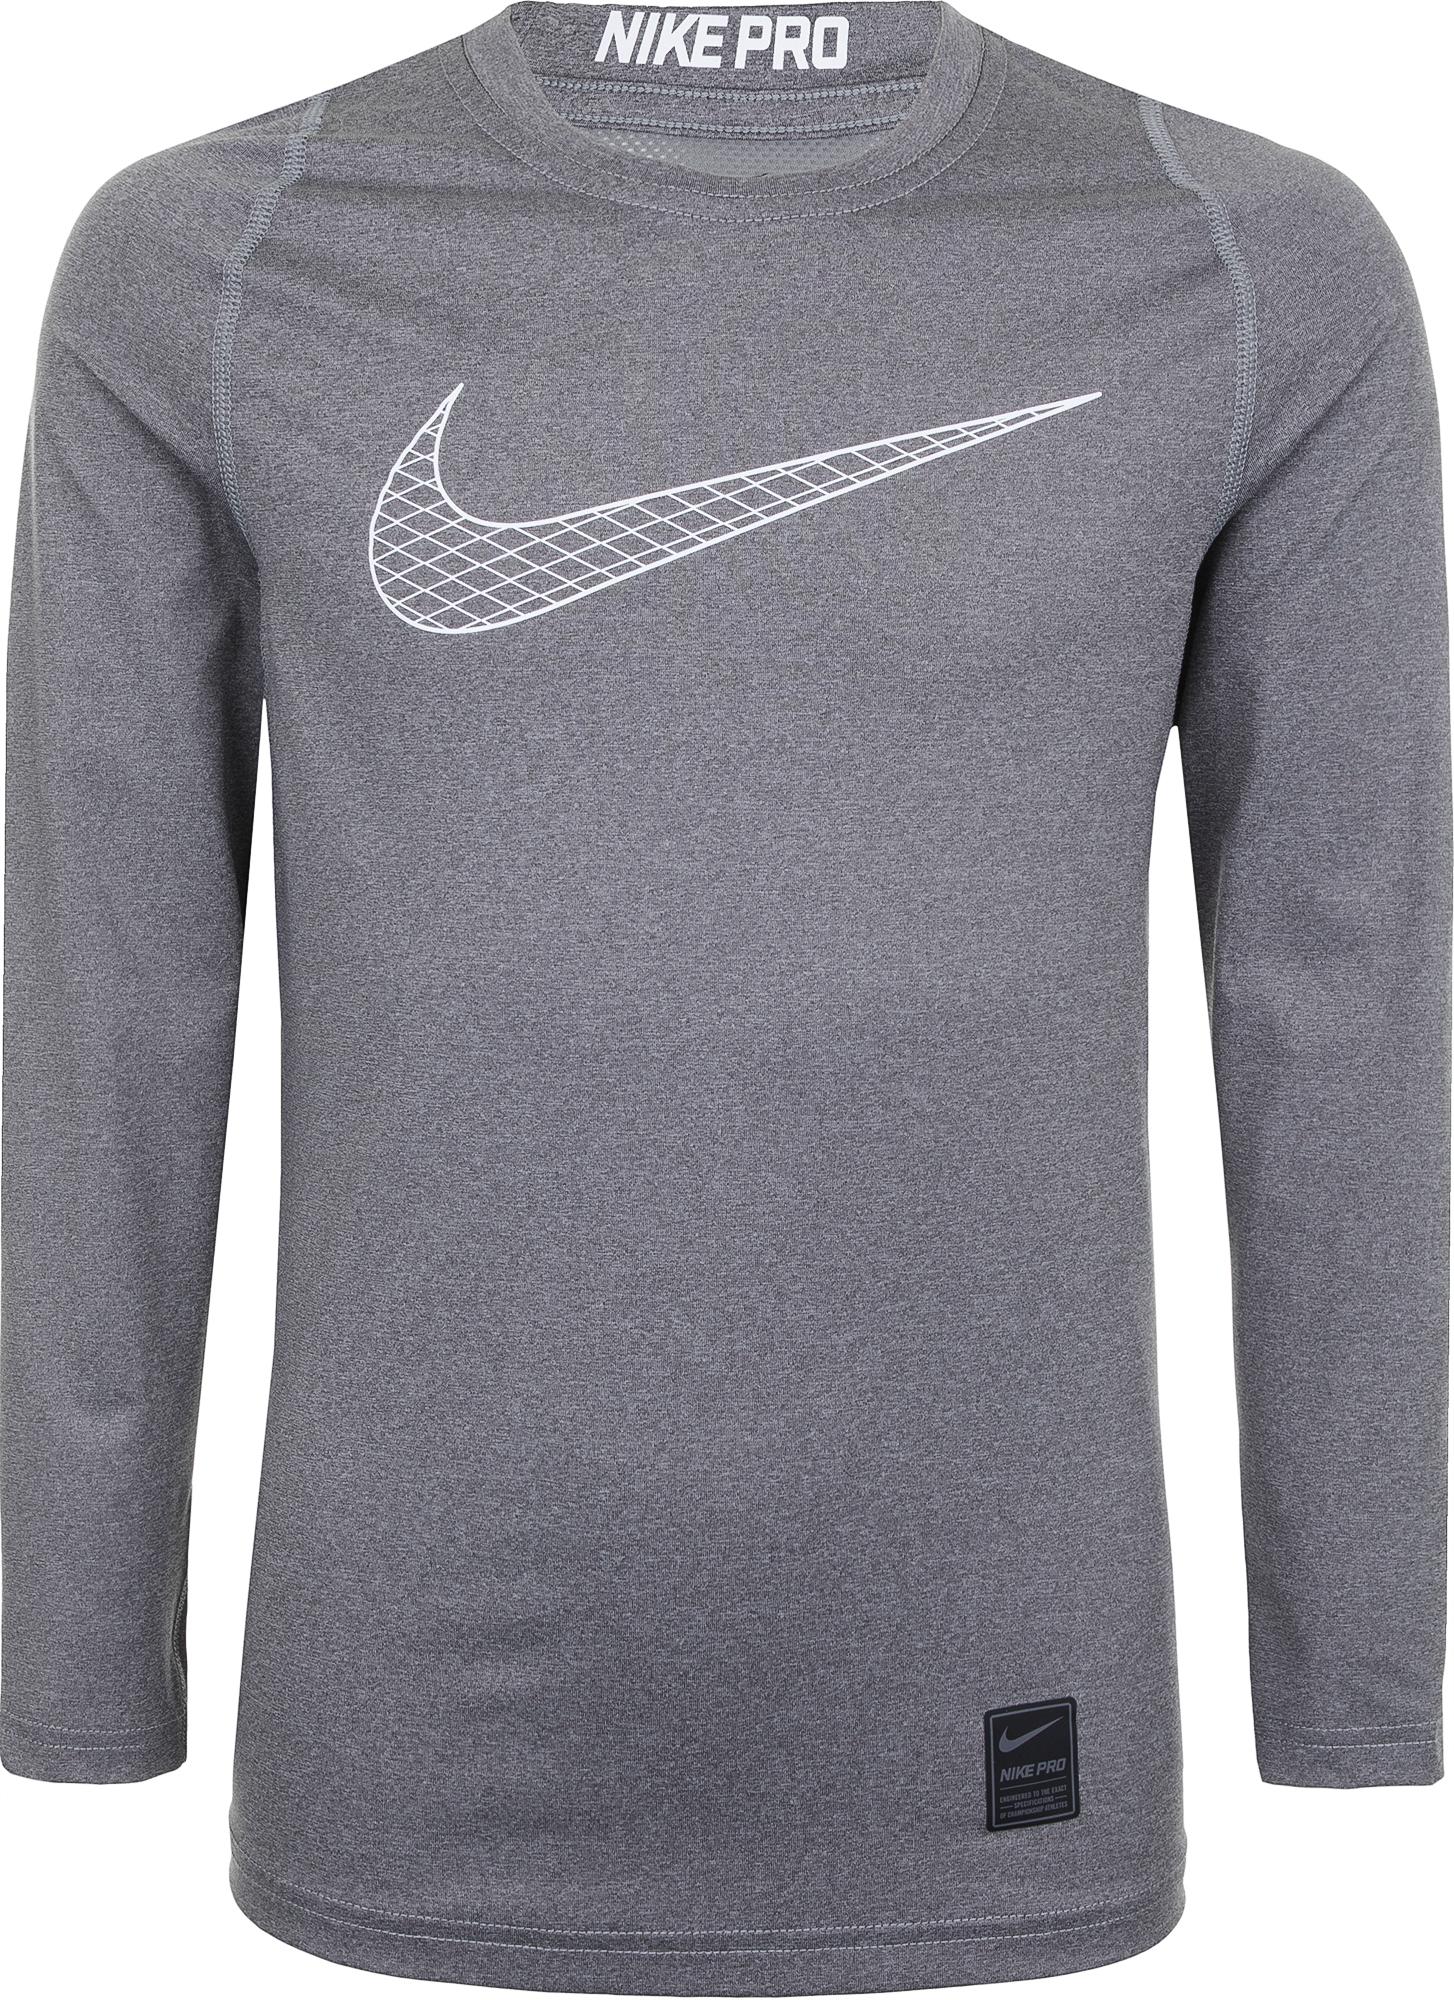 Nike Свитшот для мальчиков Nike Pro, размер 158-170 цена и фото